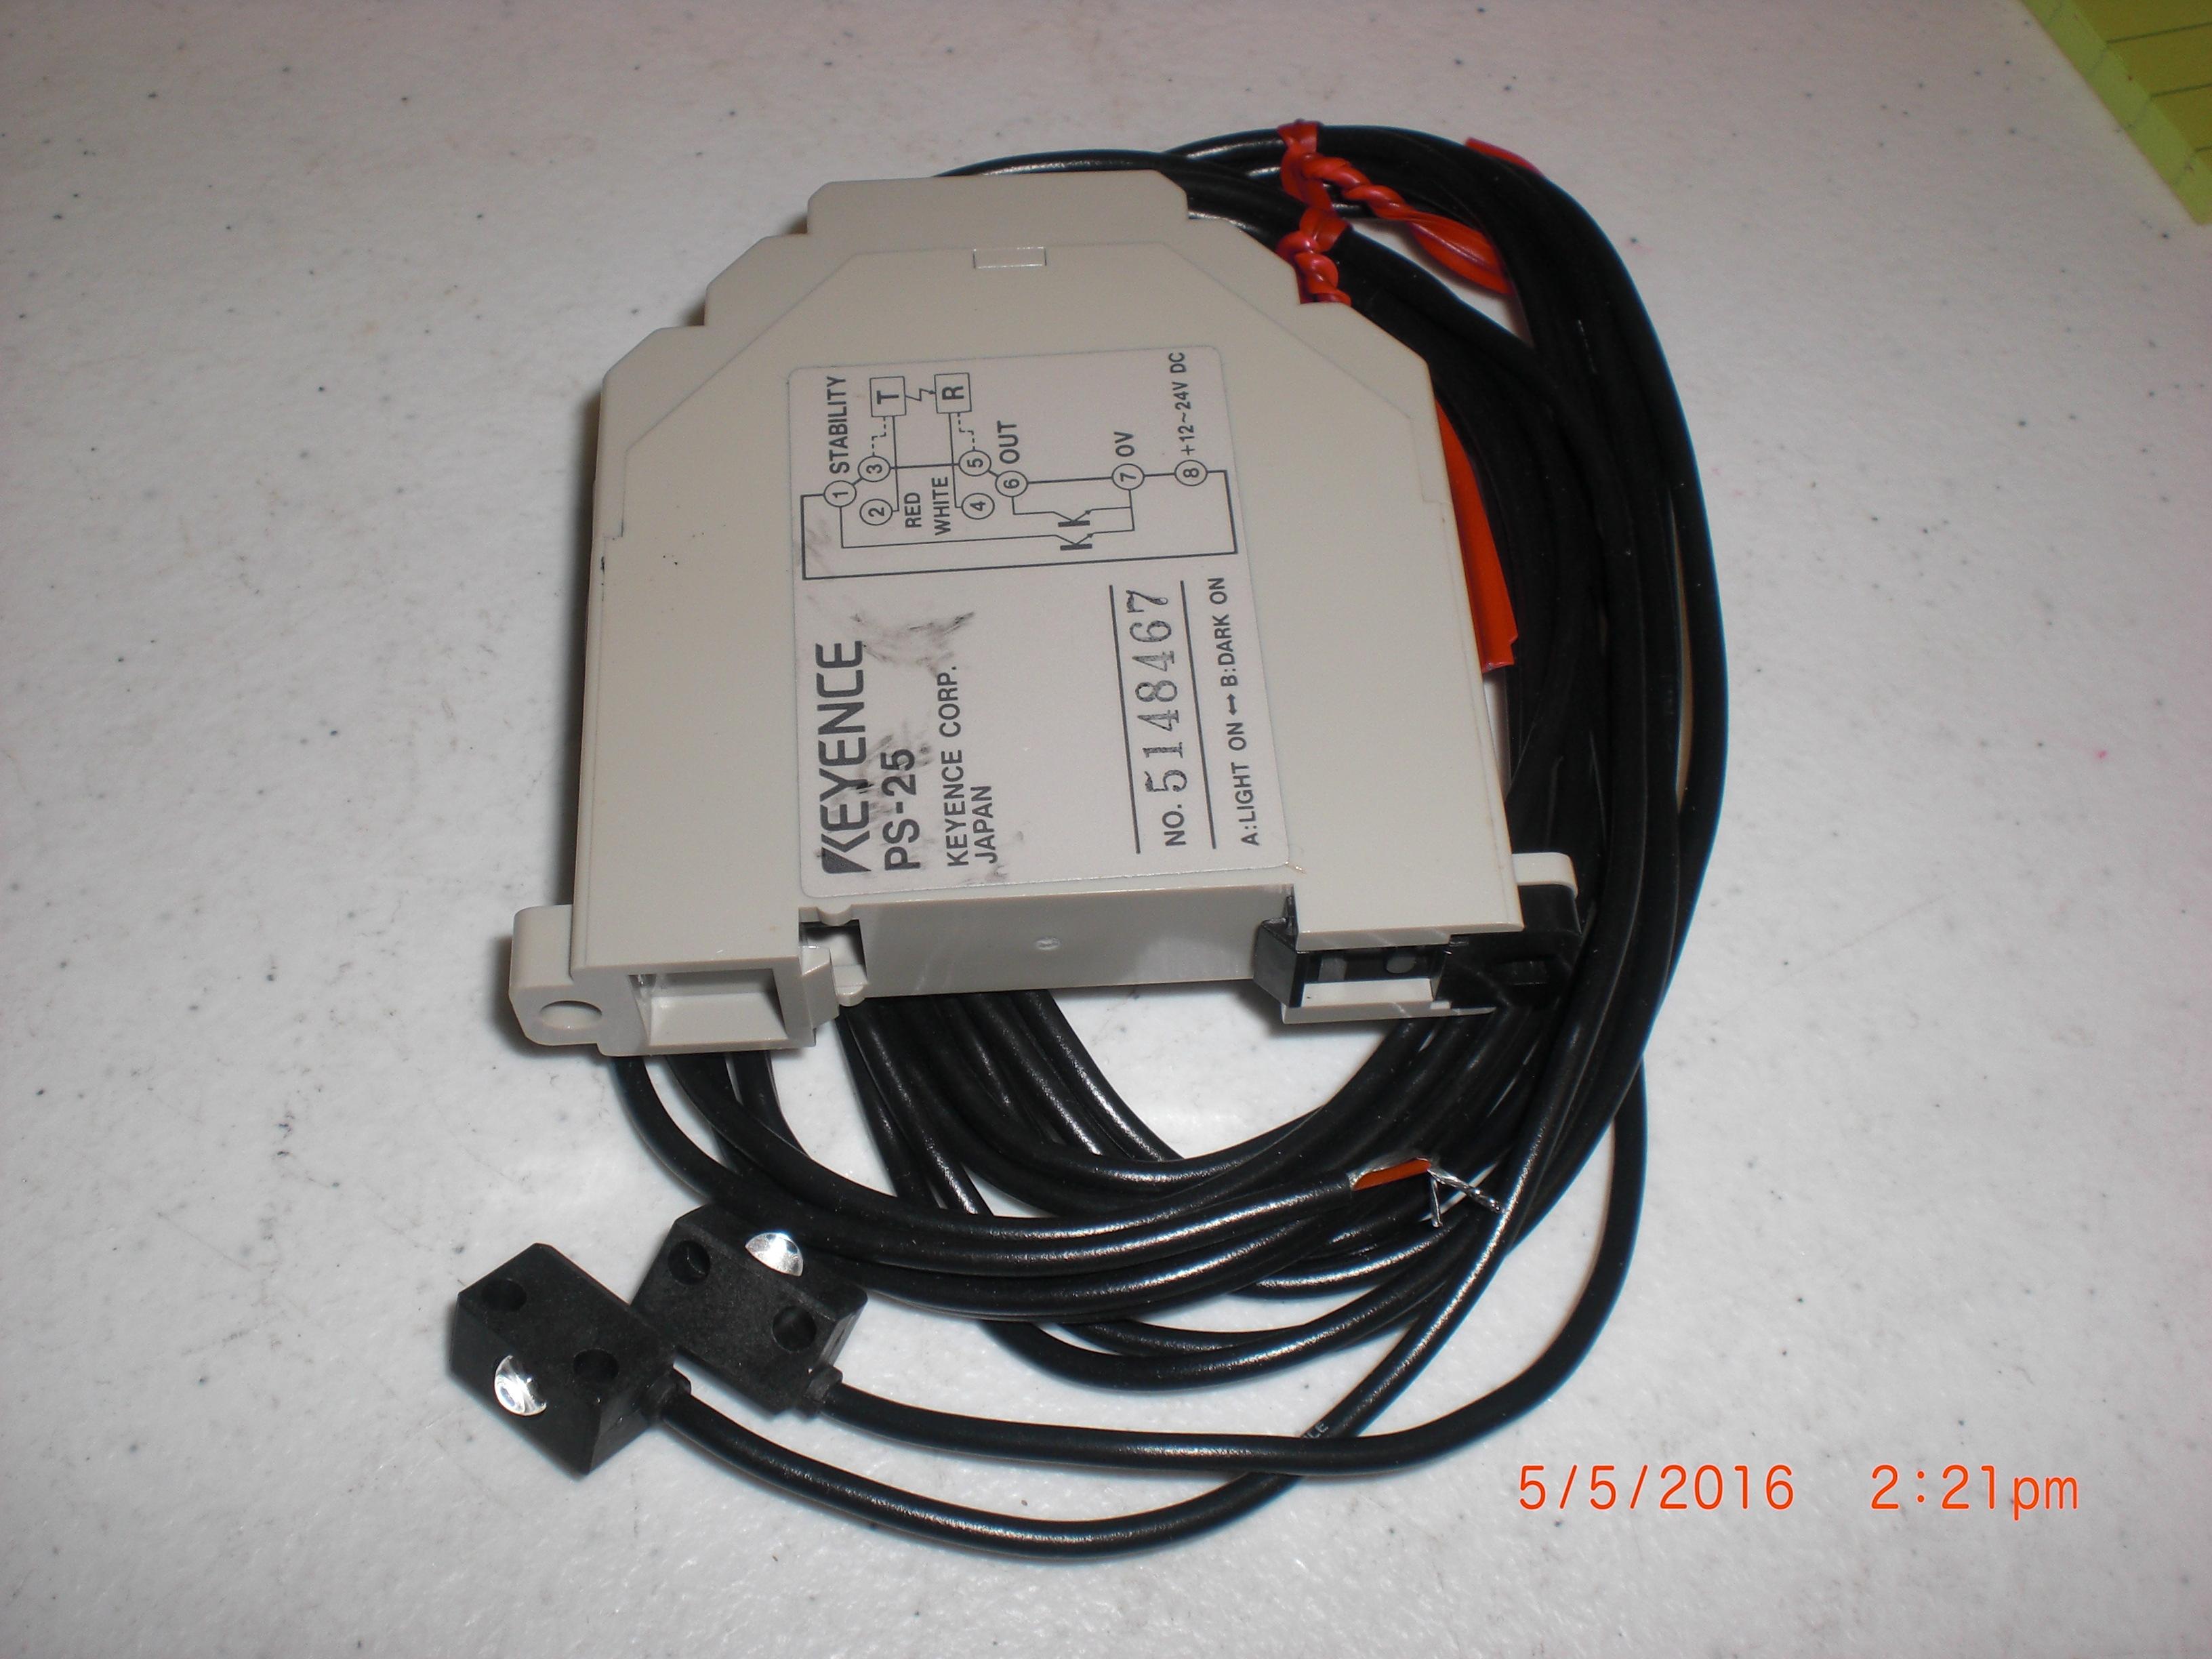 Sensor KEYENCE PS-25  12 to 24 VDC Amplifier with PS-55R sensors